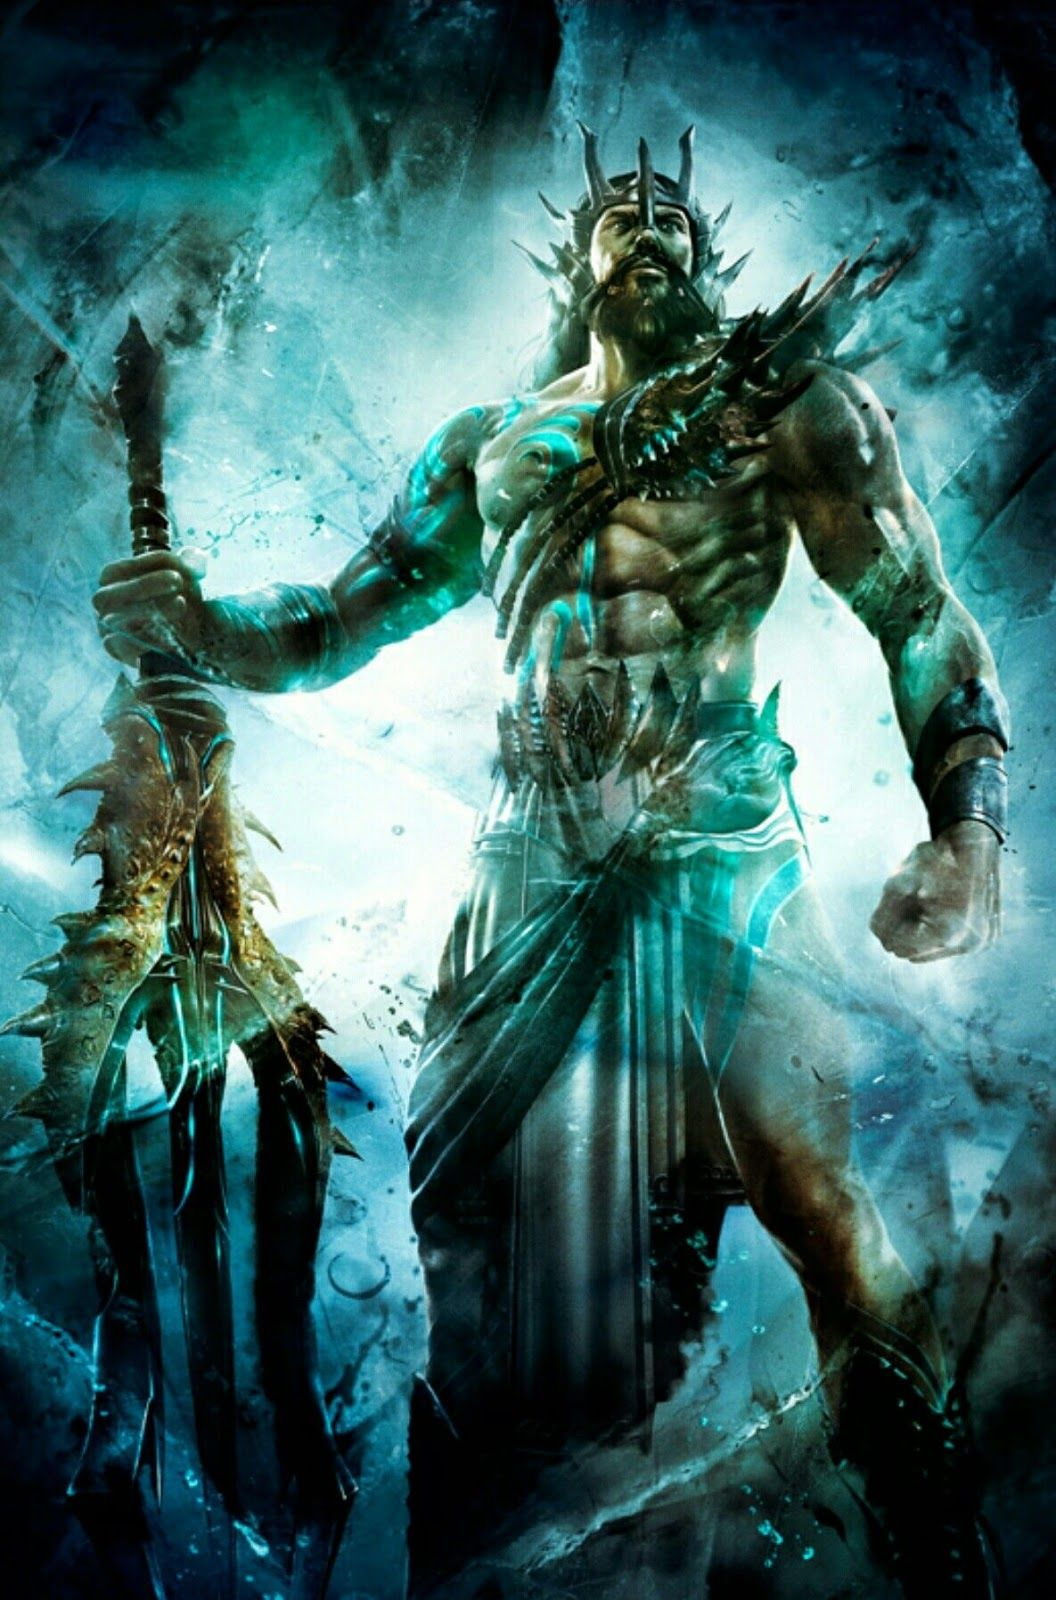 HD Wallpaper 37 god of war in 2019 God of War Greek mythology 1056x1600